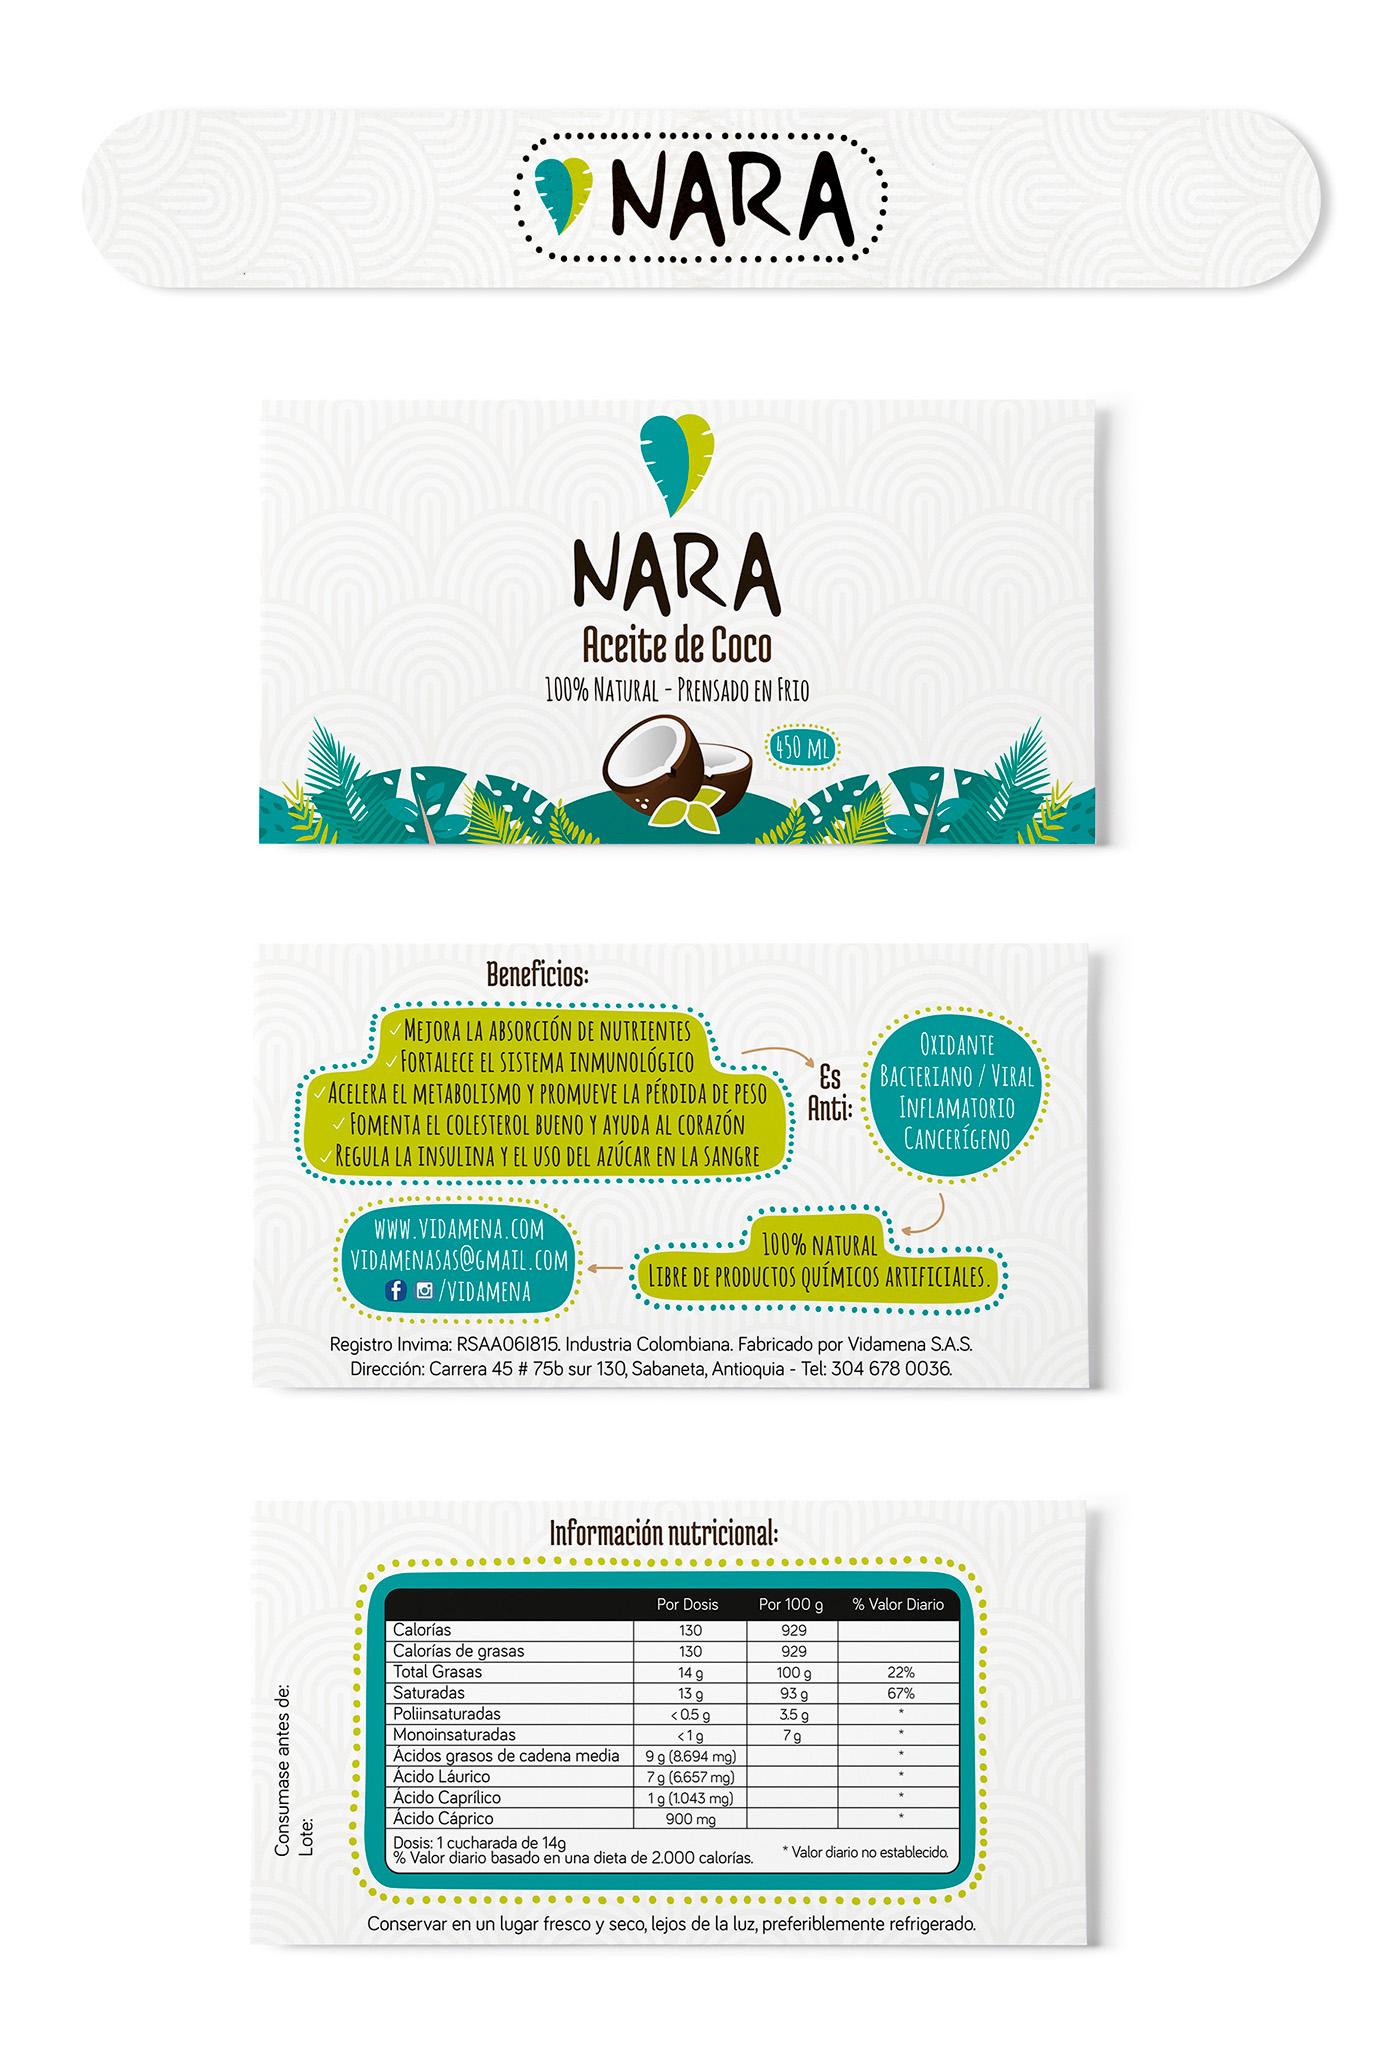 NARA // Identidad Visual on Behance